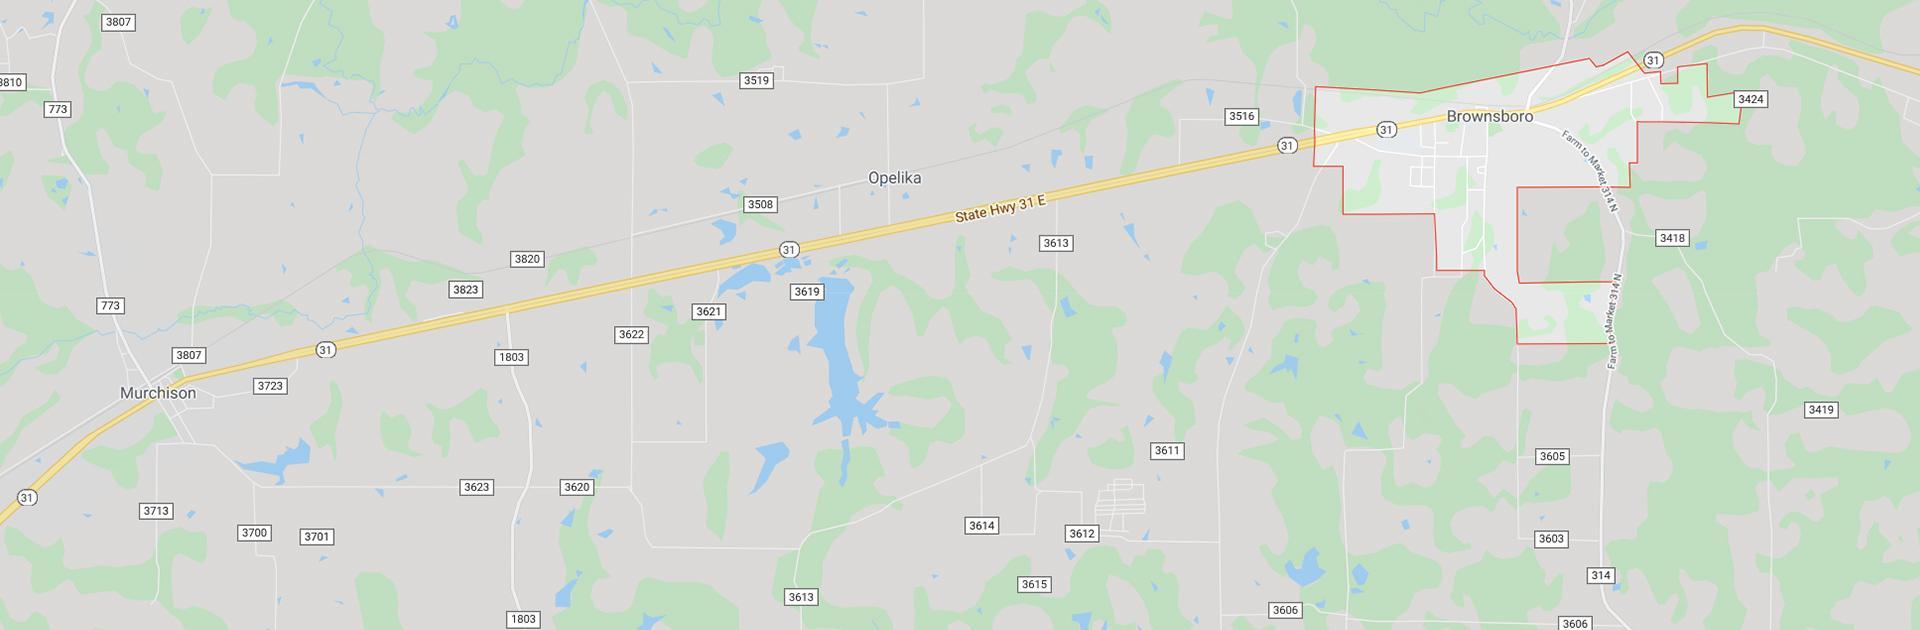 a map of brownsboro texas